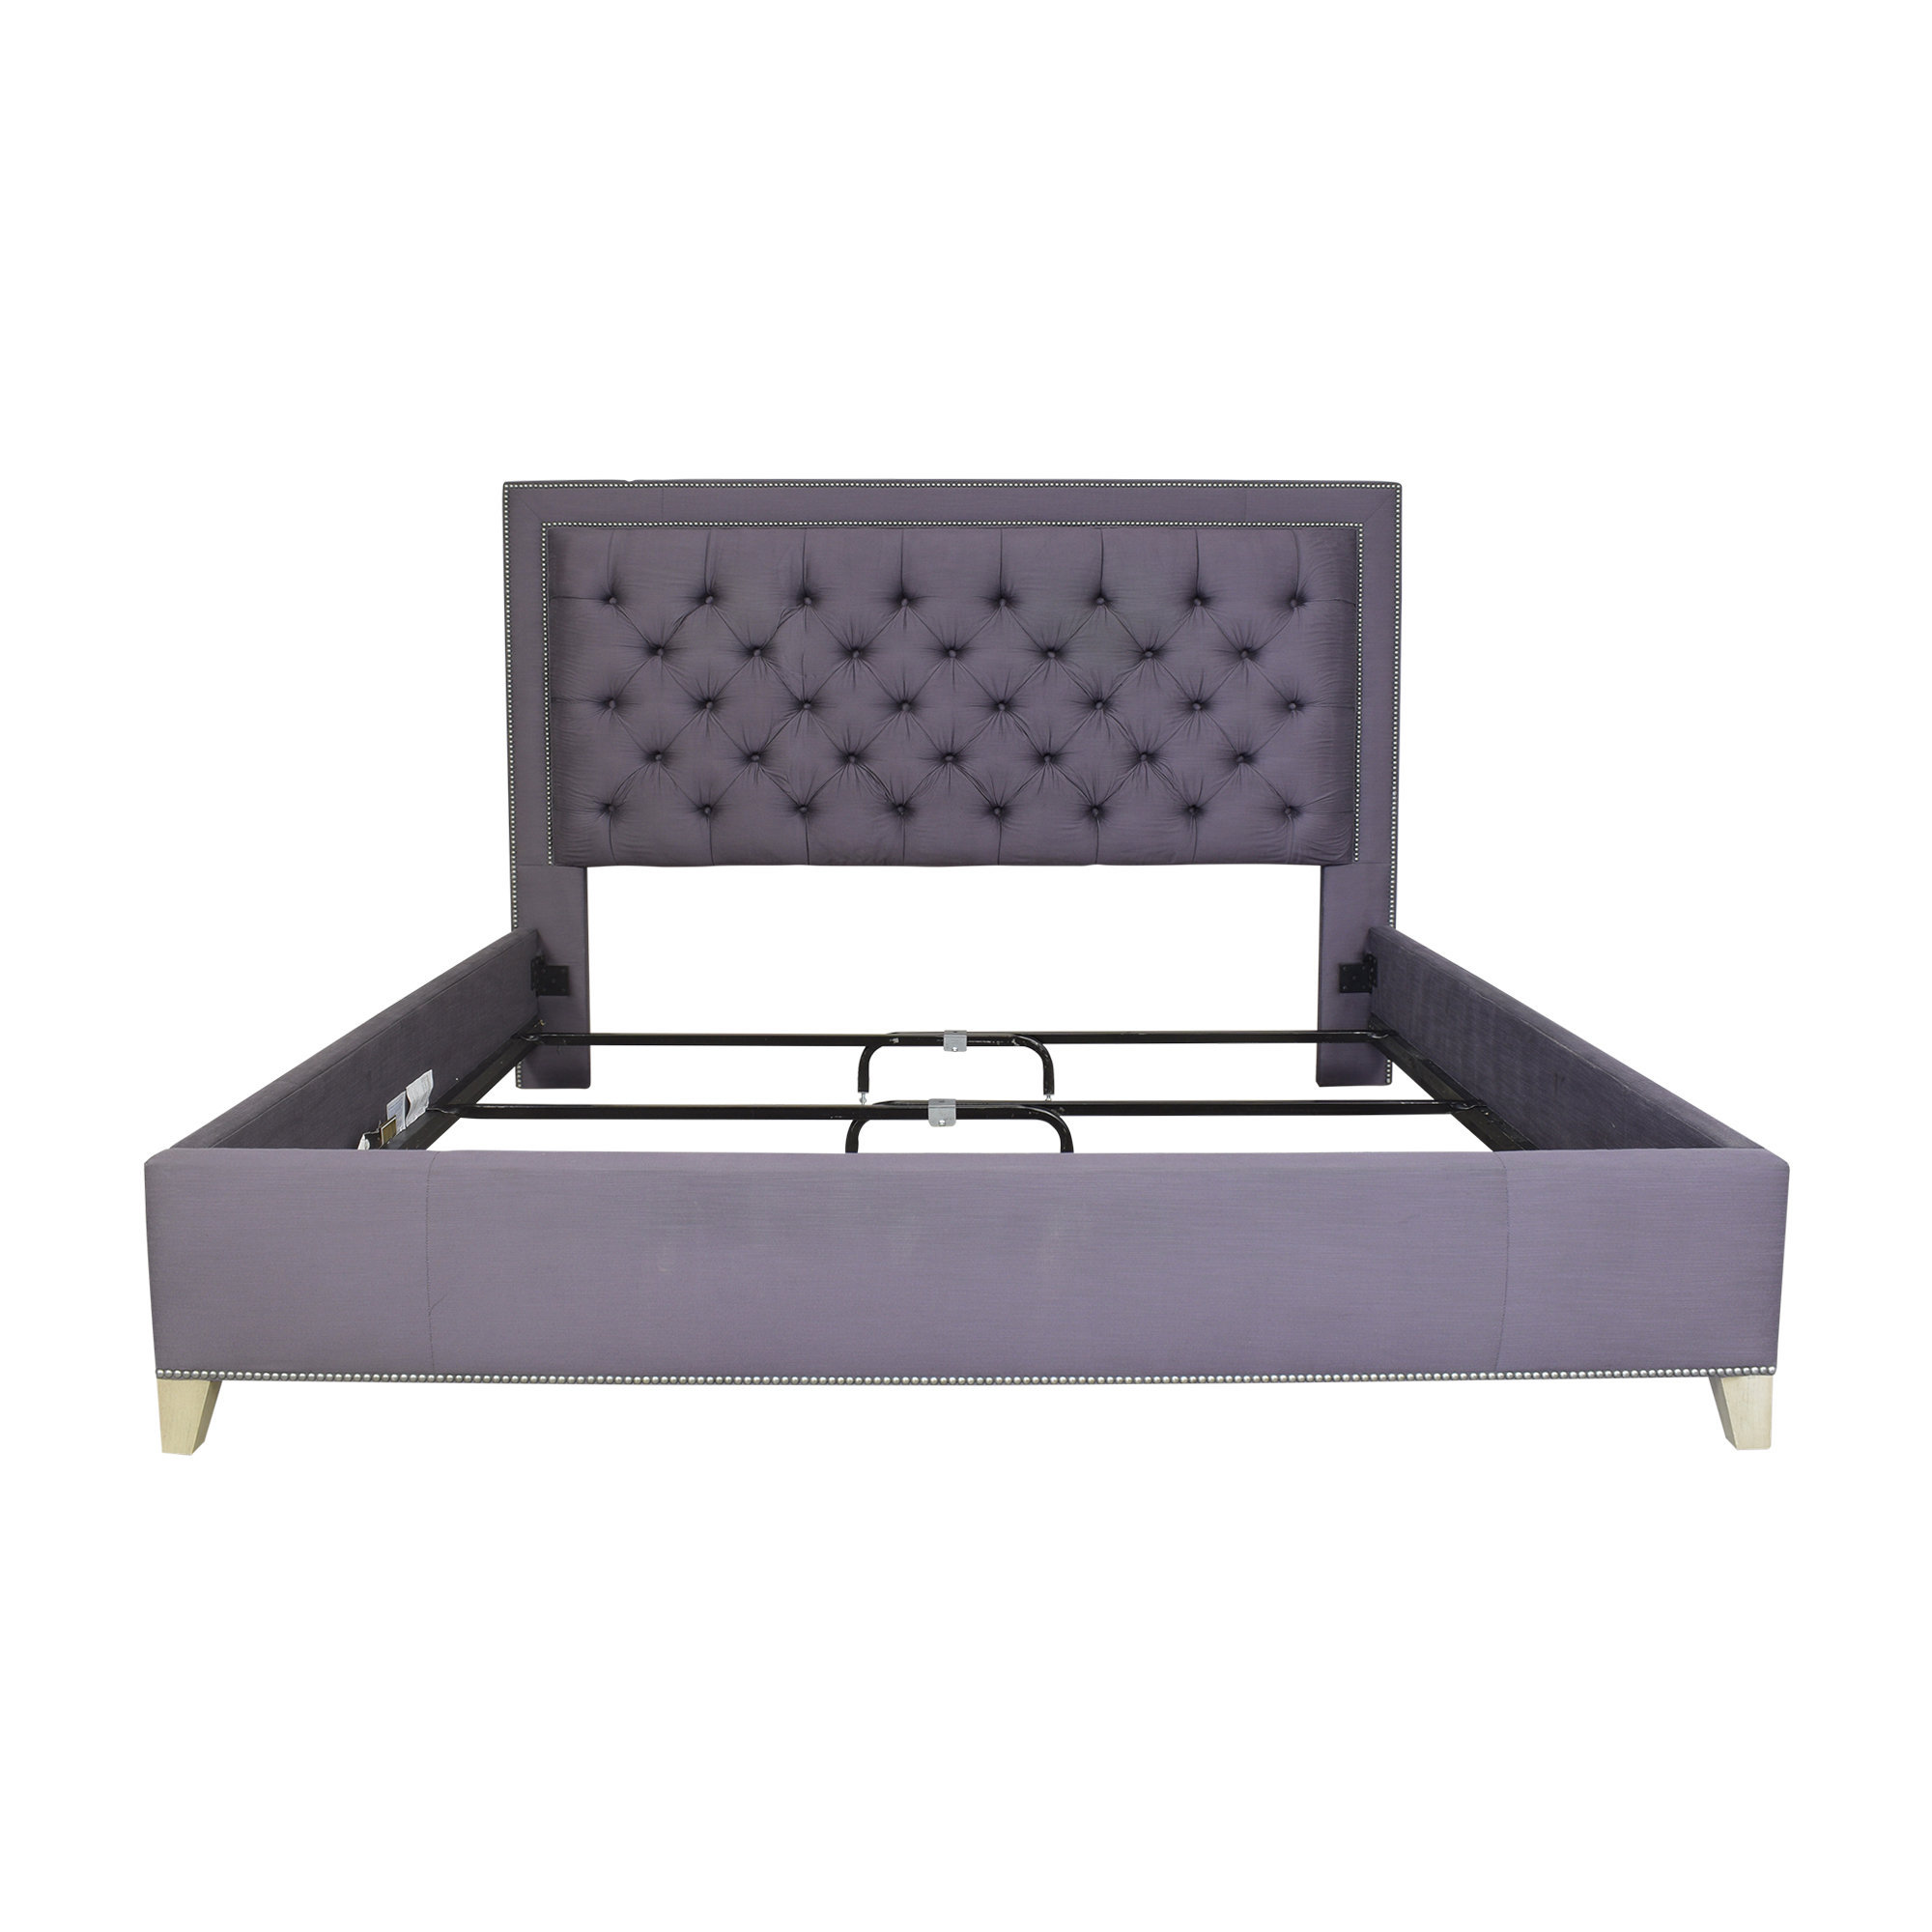 Vanguard Furniture Vanguard Furniture Tufted King Bed dimensions